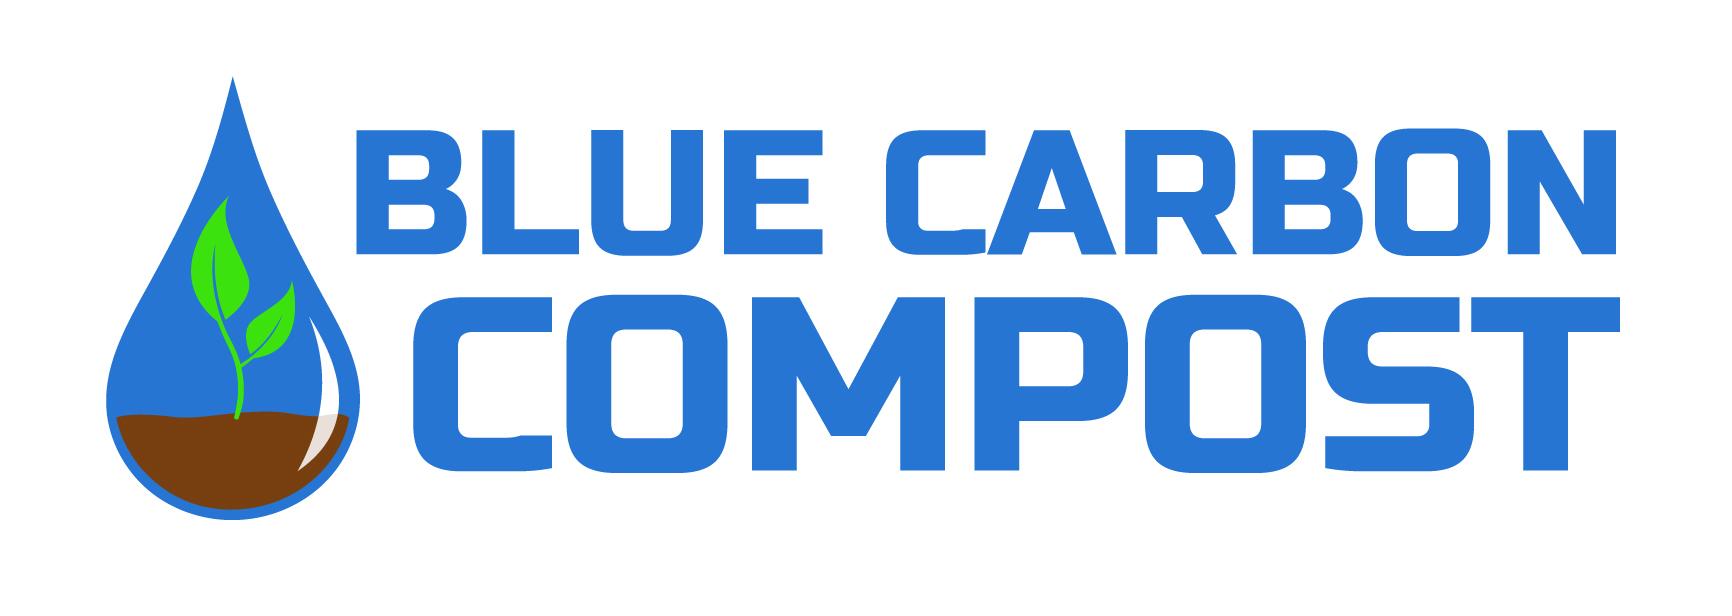 BlueCarbonCompost_FINAL.jpg